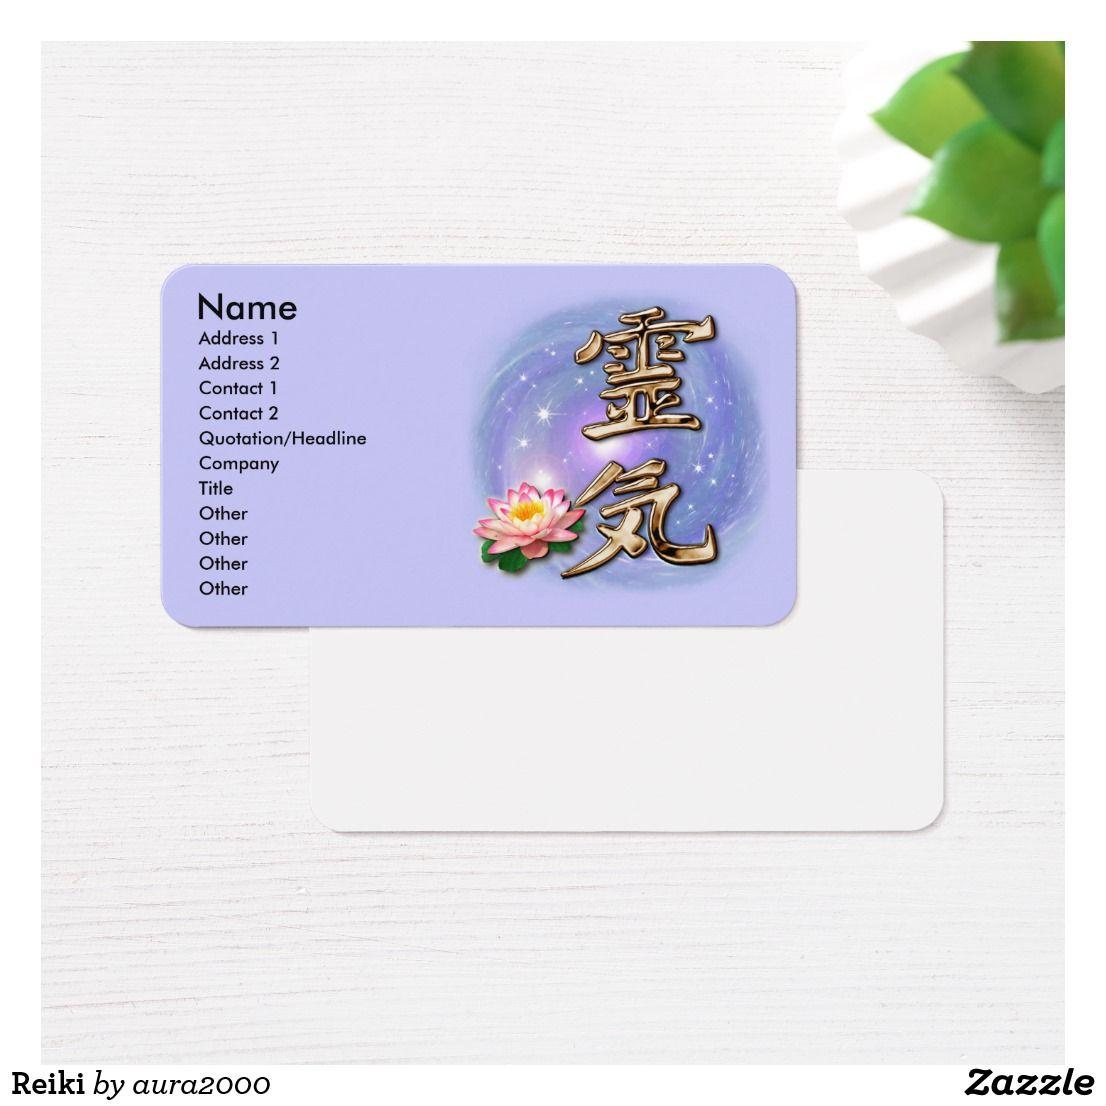 Reiki Business Card | Stuff SOLD on Zazzle | Pinterest